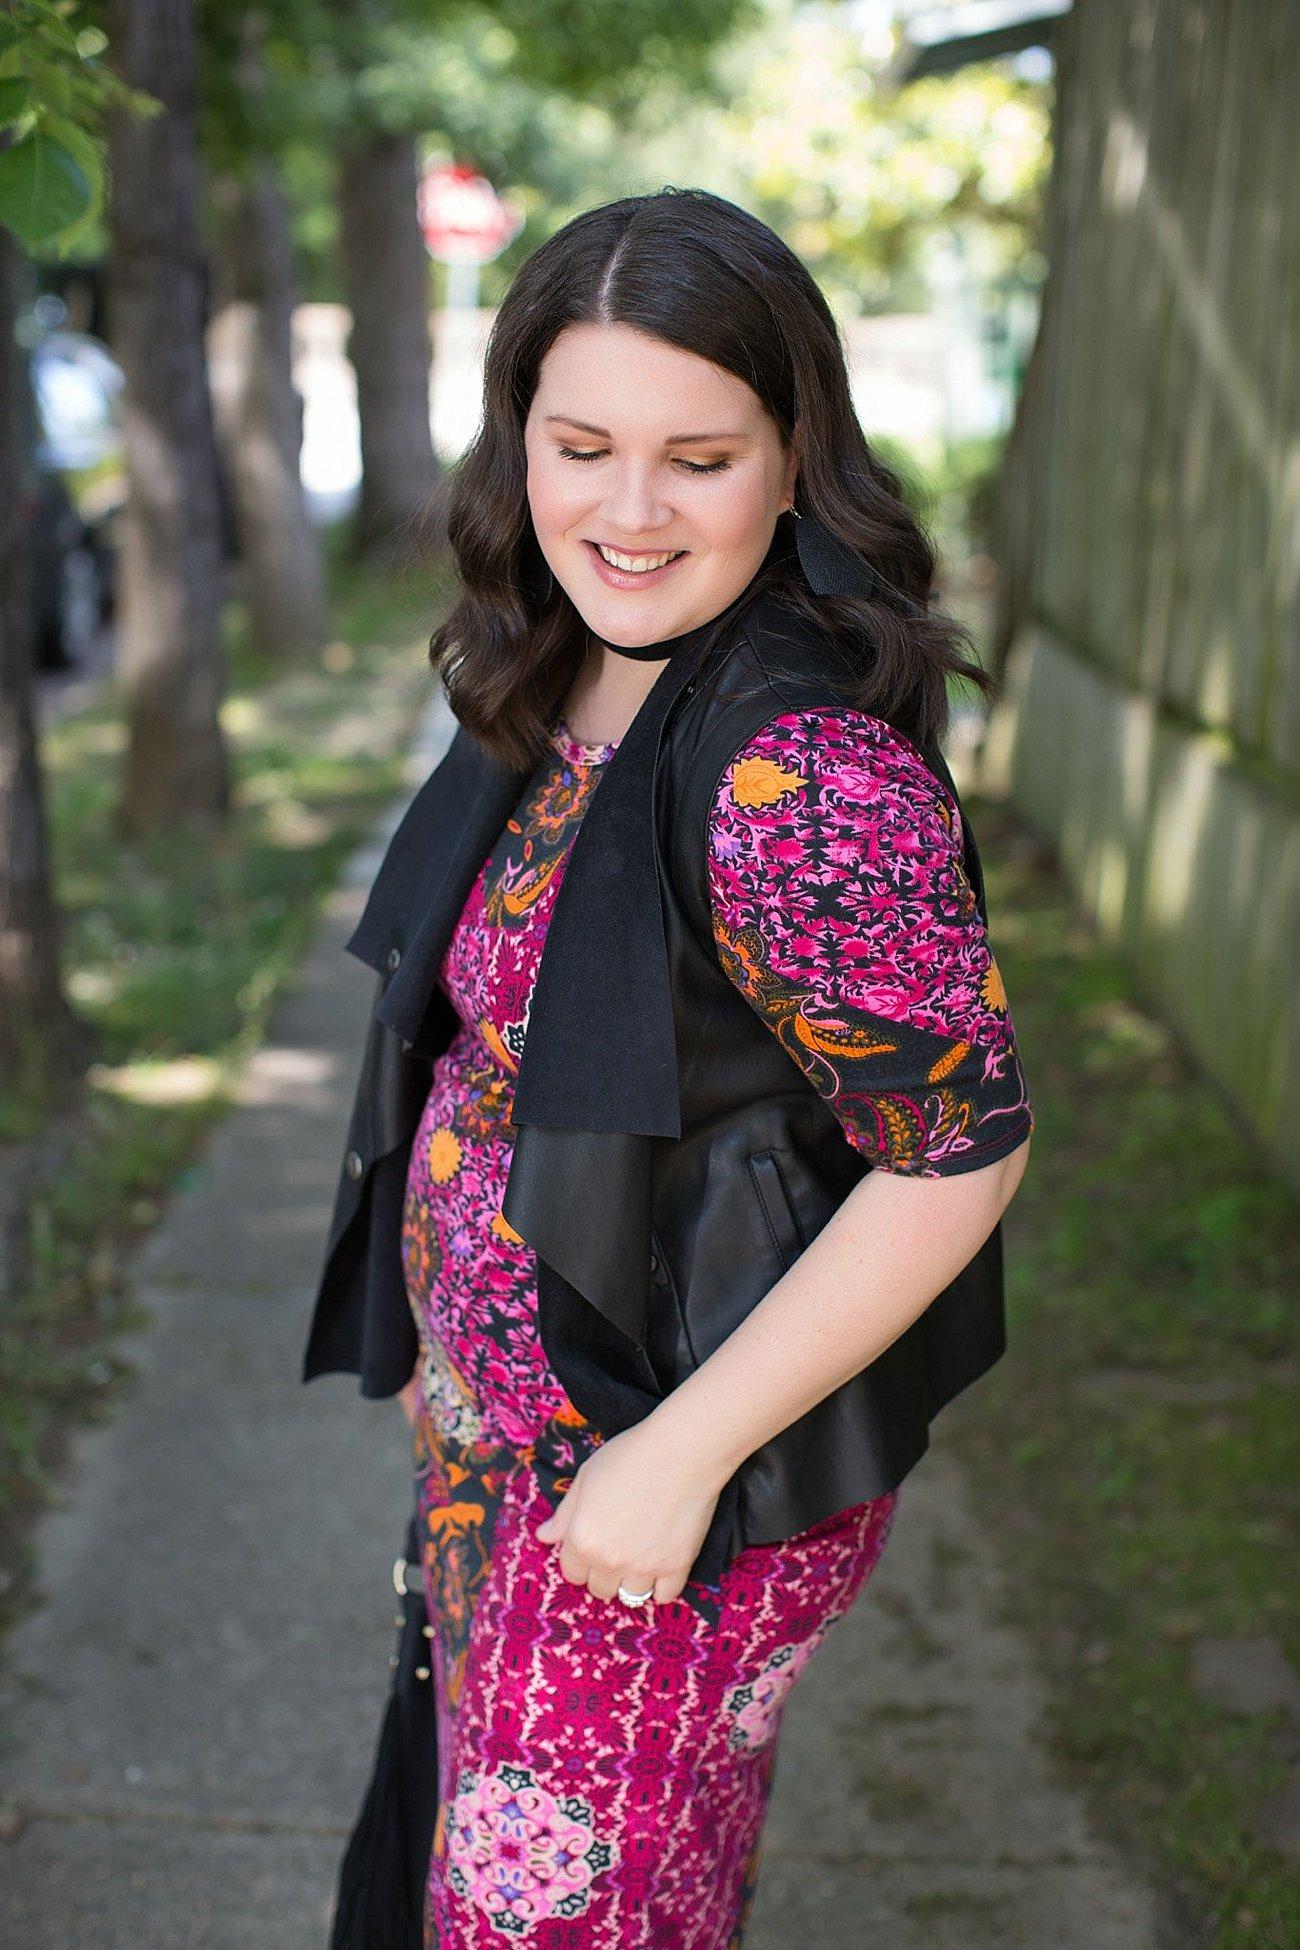 LulaRoe Julia Dress, Stitch Fix Kut From the Kloth Leather Vest, Nickel & Suede Earrings, Nickel & Suede Choker   North Carolina Fashion & Style Blogger (8)